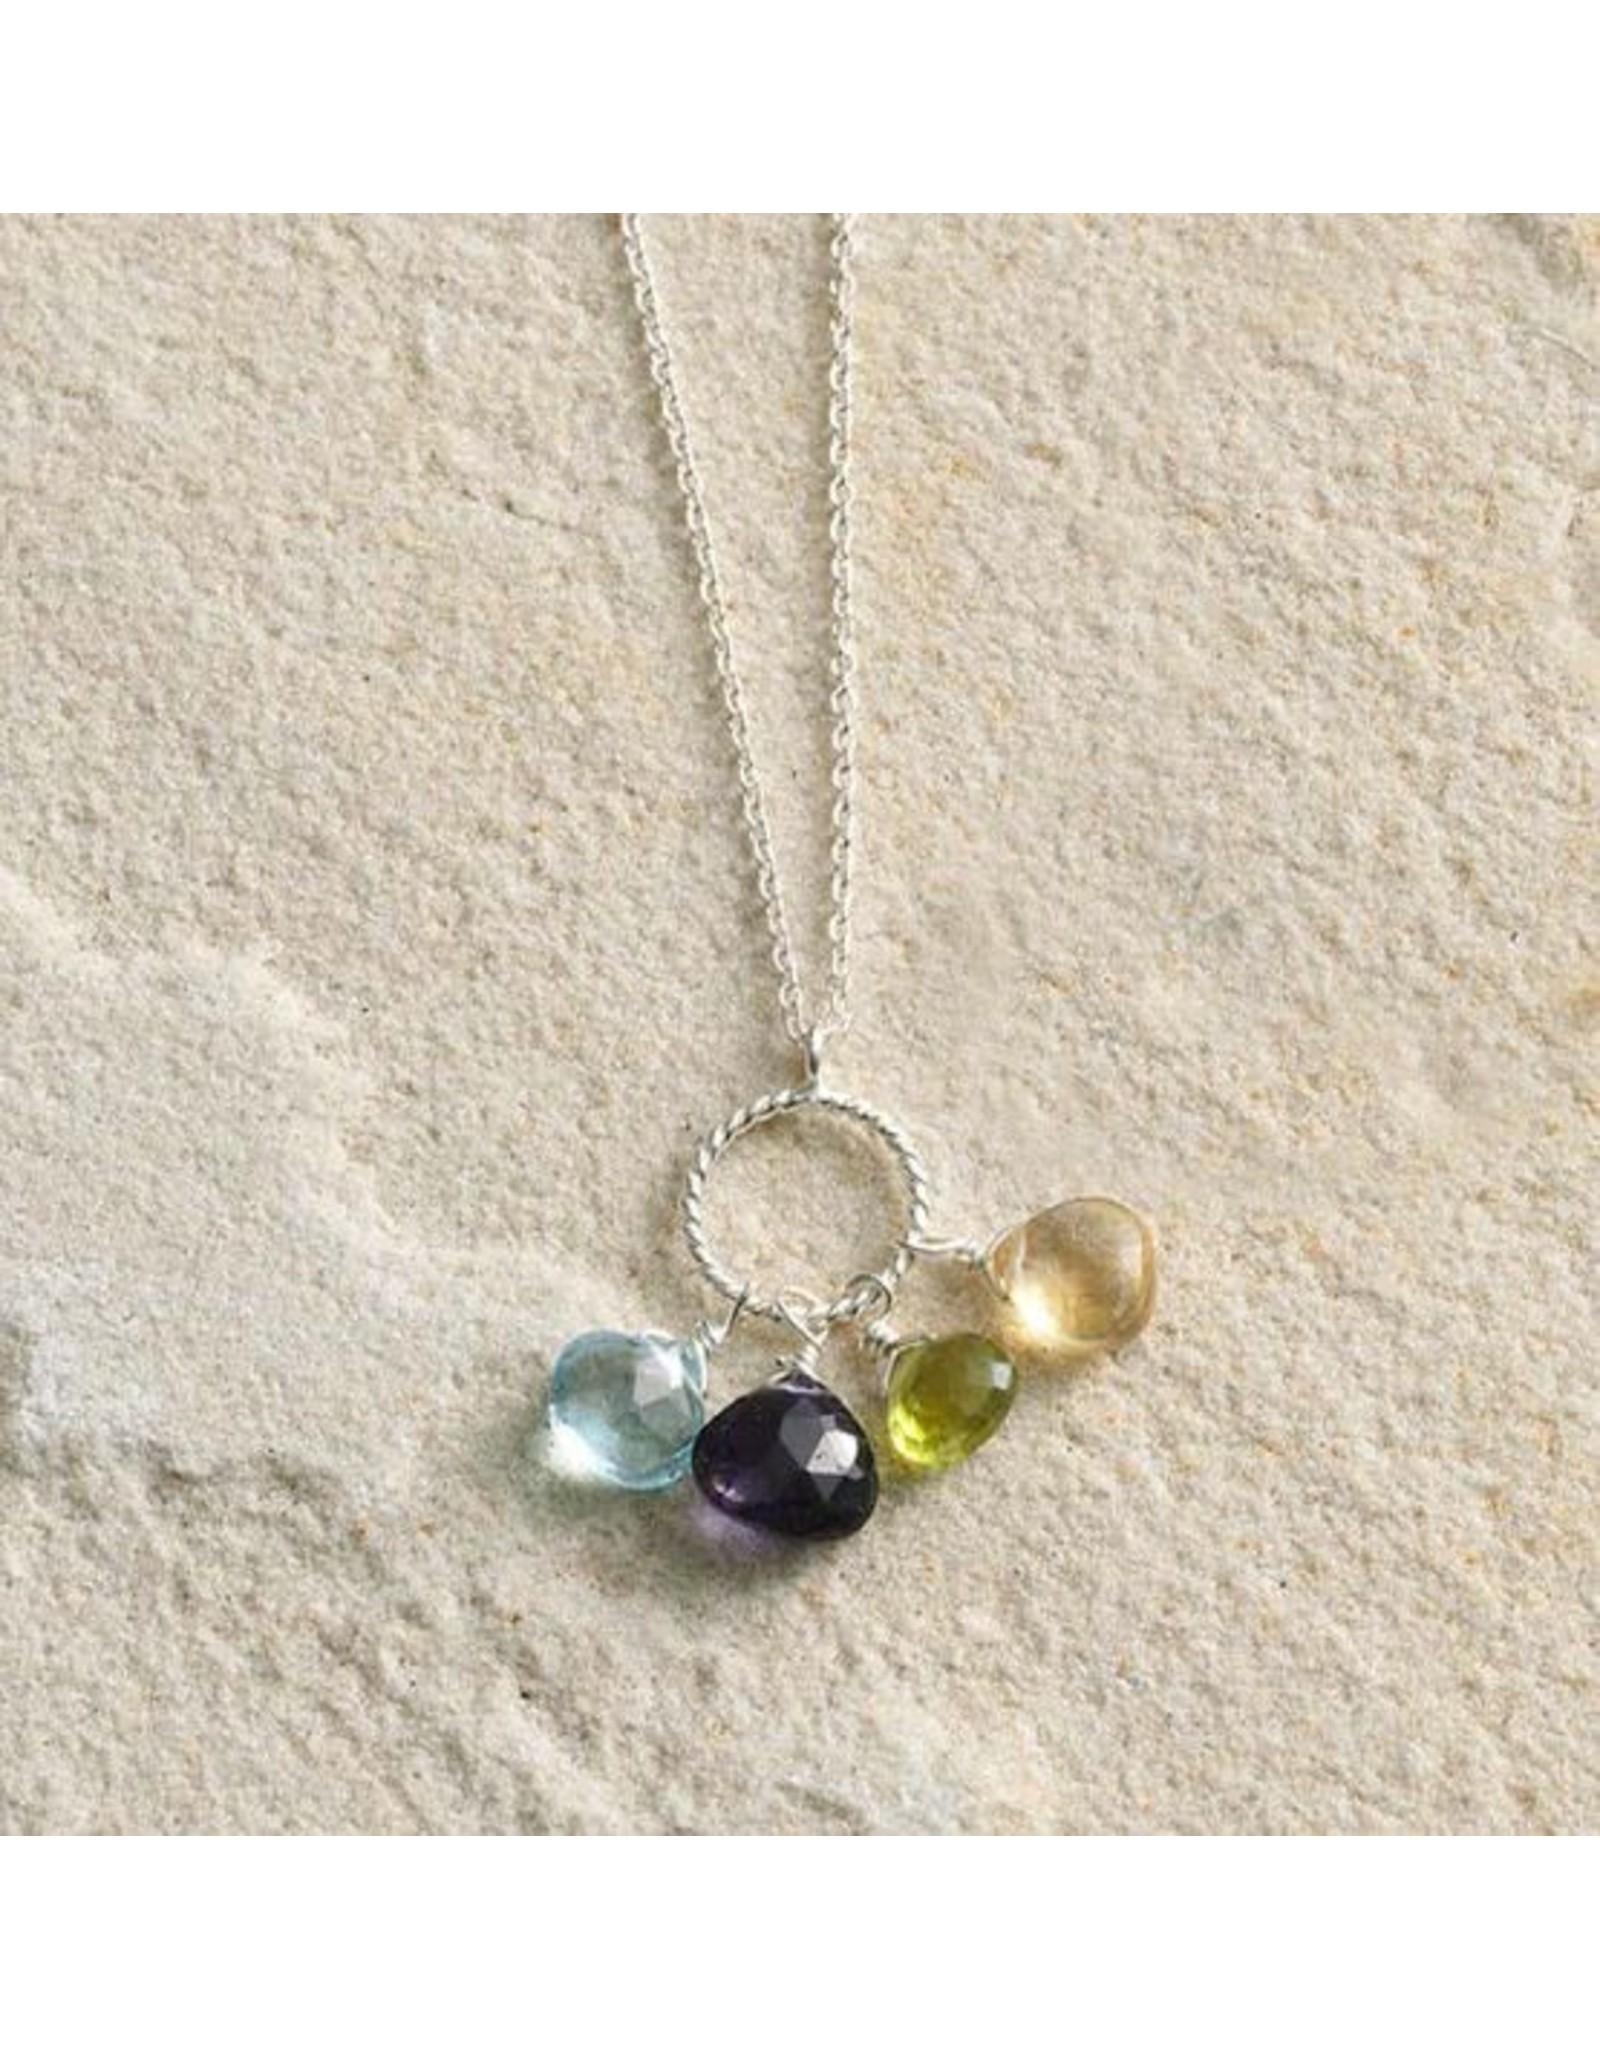 Semi Precious Stones Pendant Necklace, India